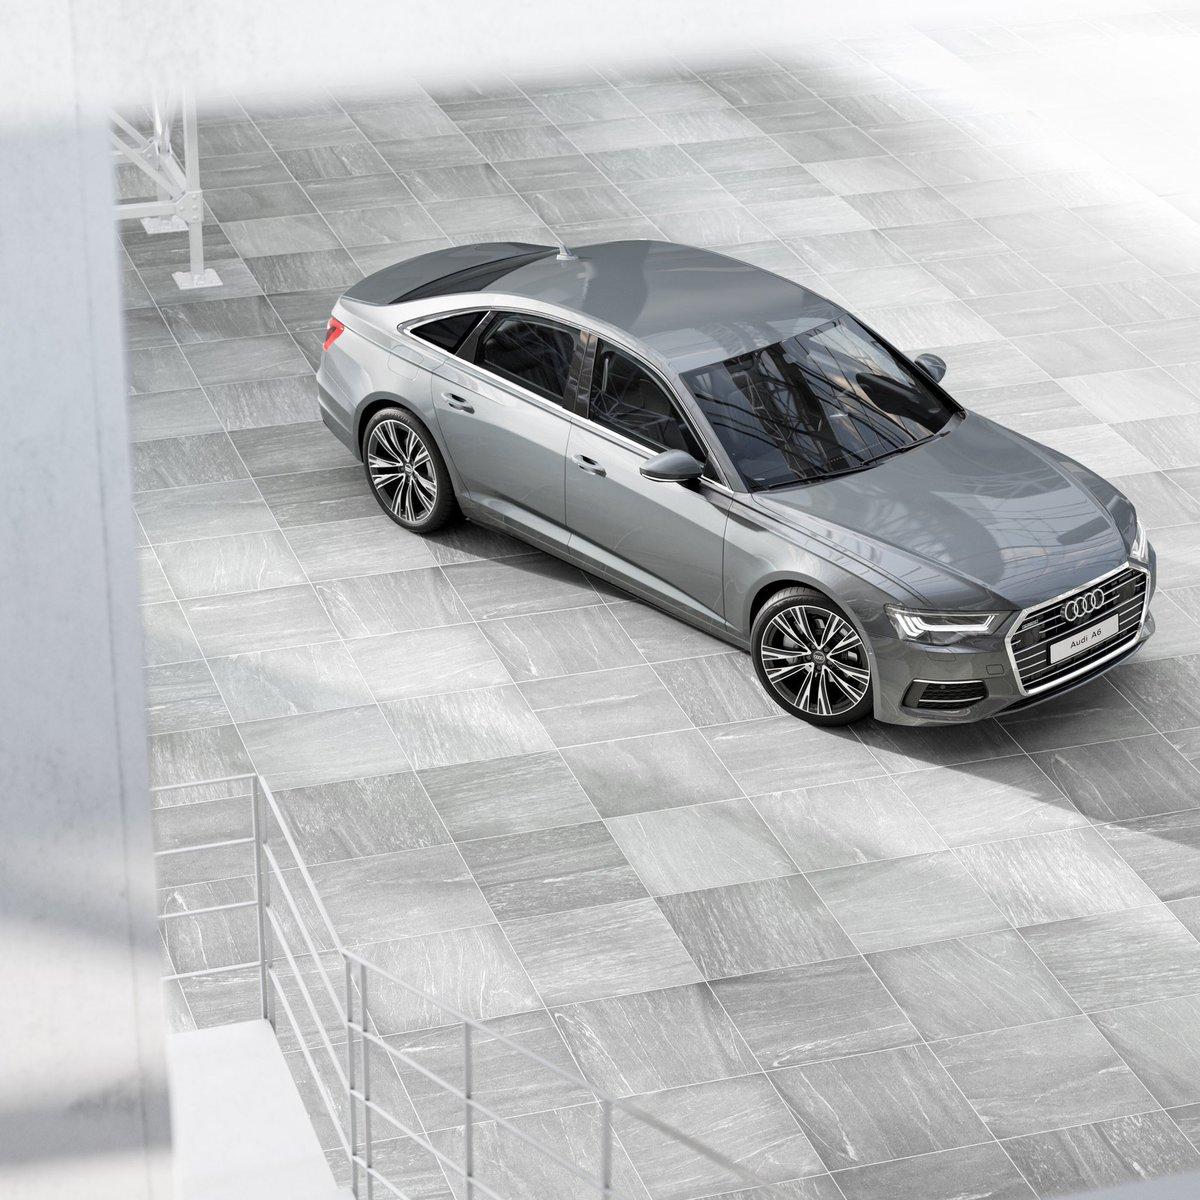 Clear statement from any angle  #Audi #Audisaudiarabia #AudiA6 #Vehicles #Automotive #أودي #أودي_السعودية #سيارات